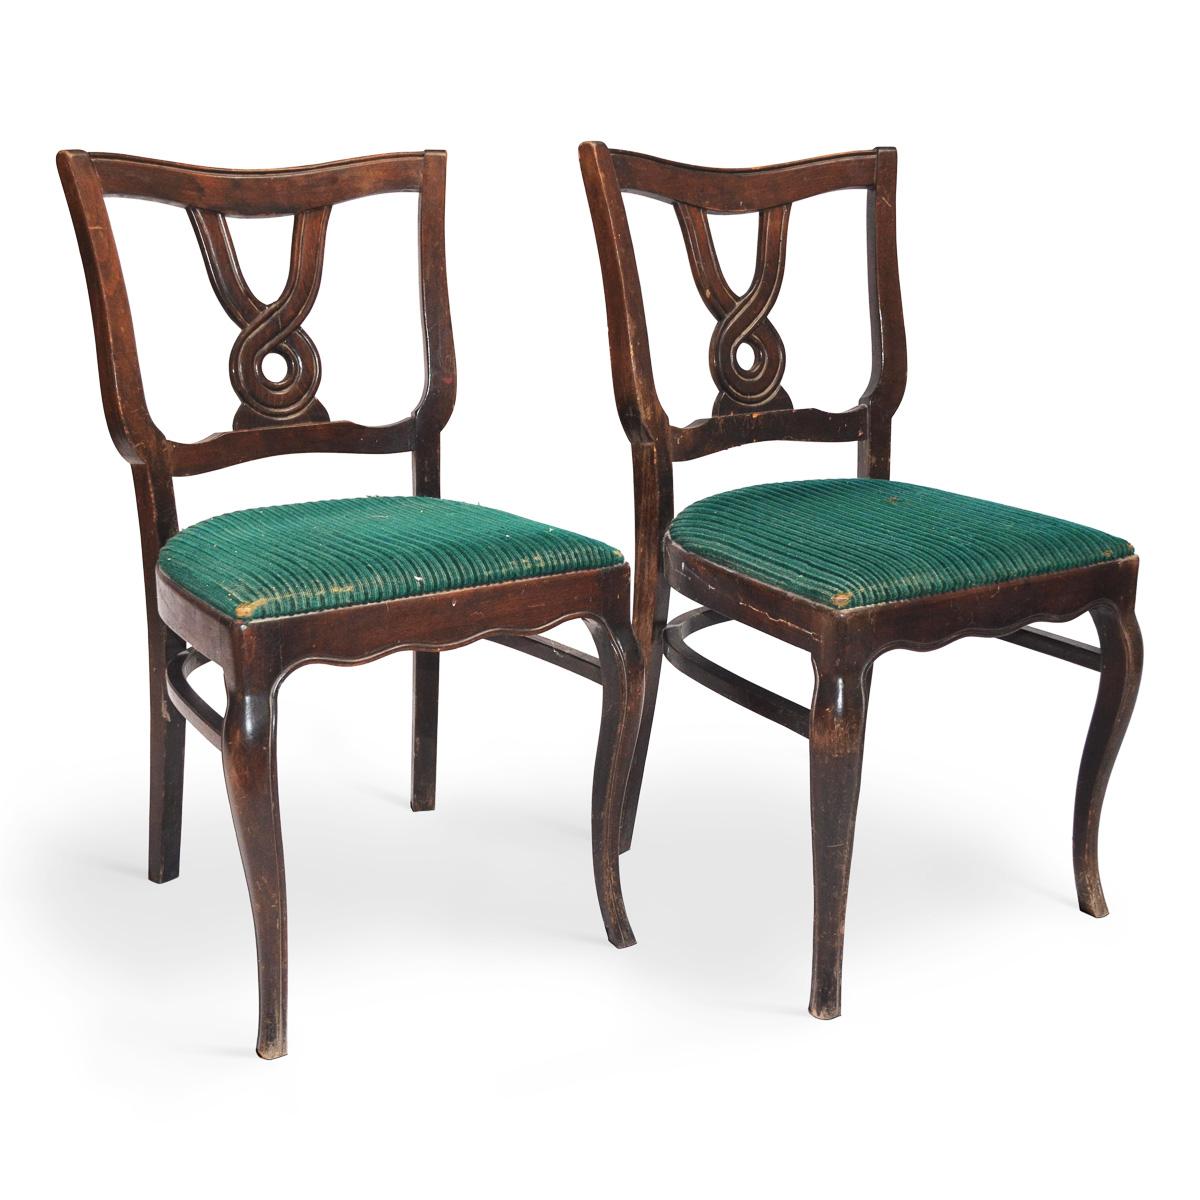 Zámecké židle